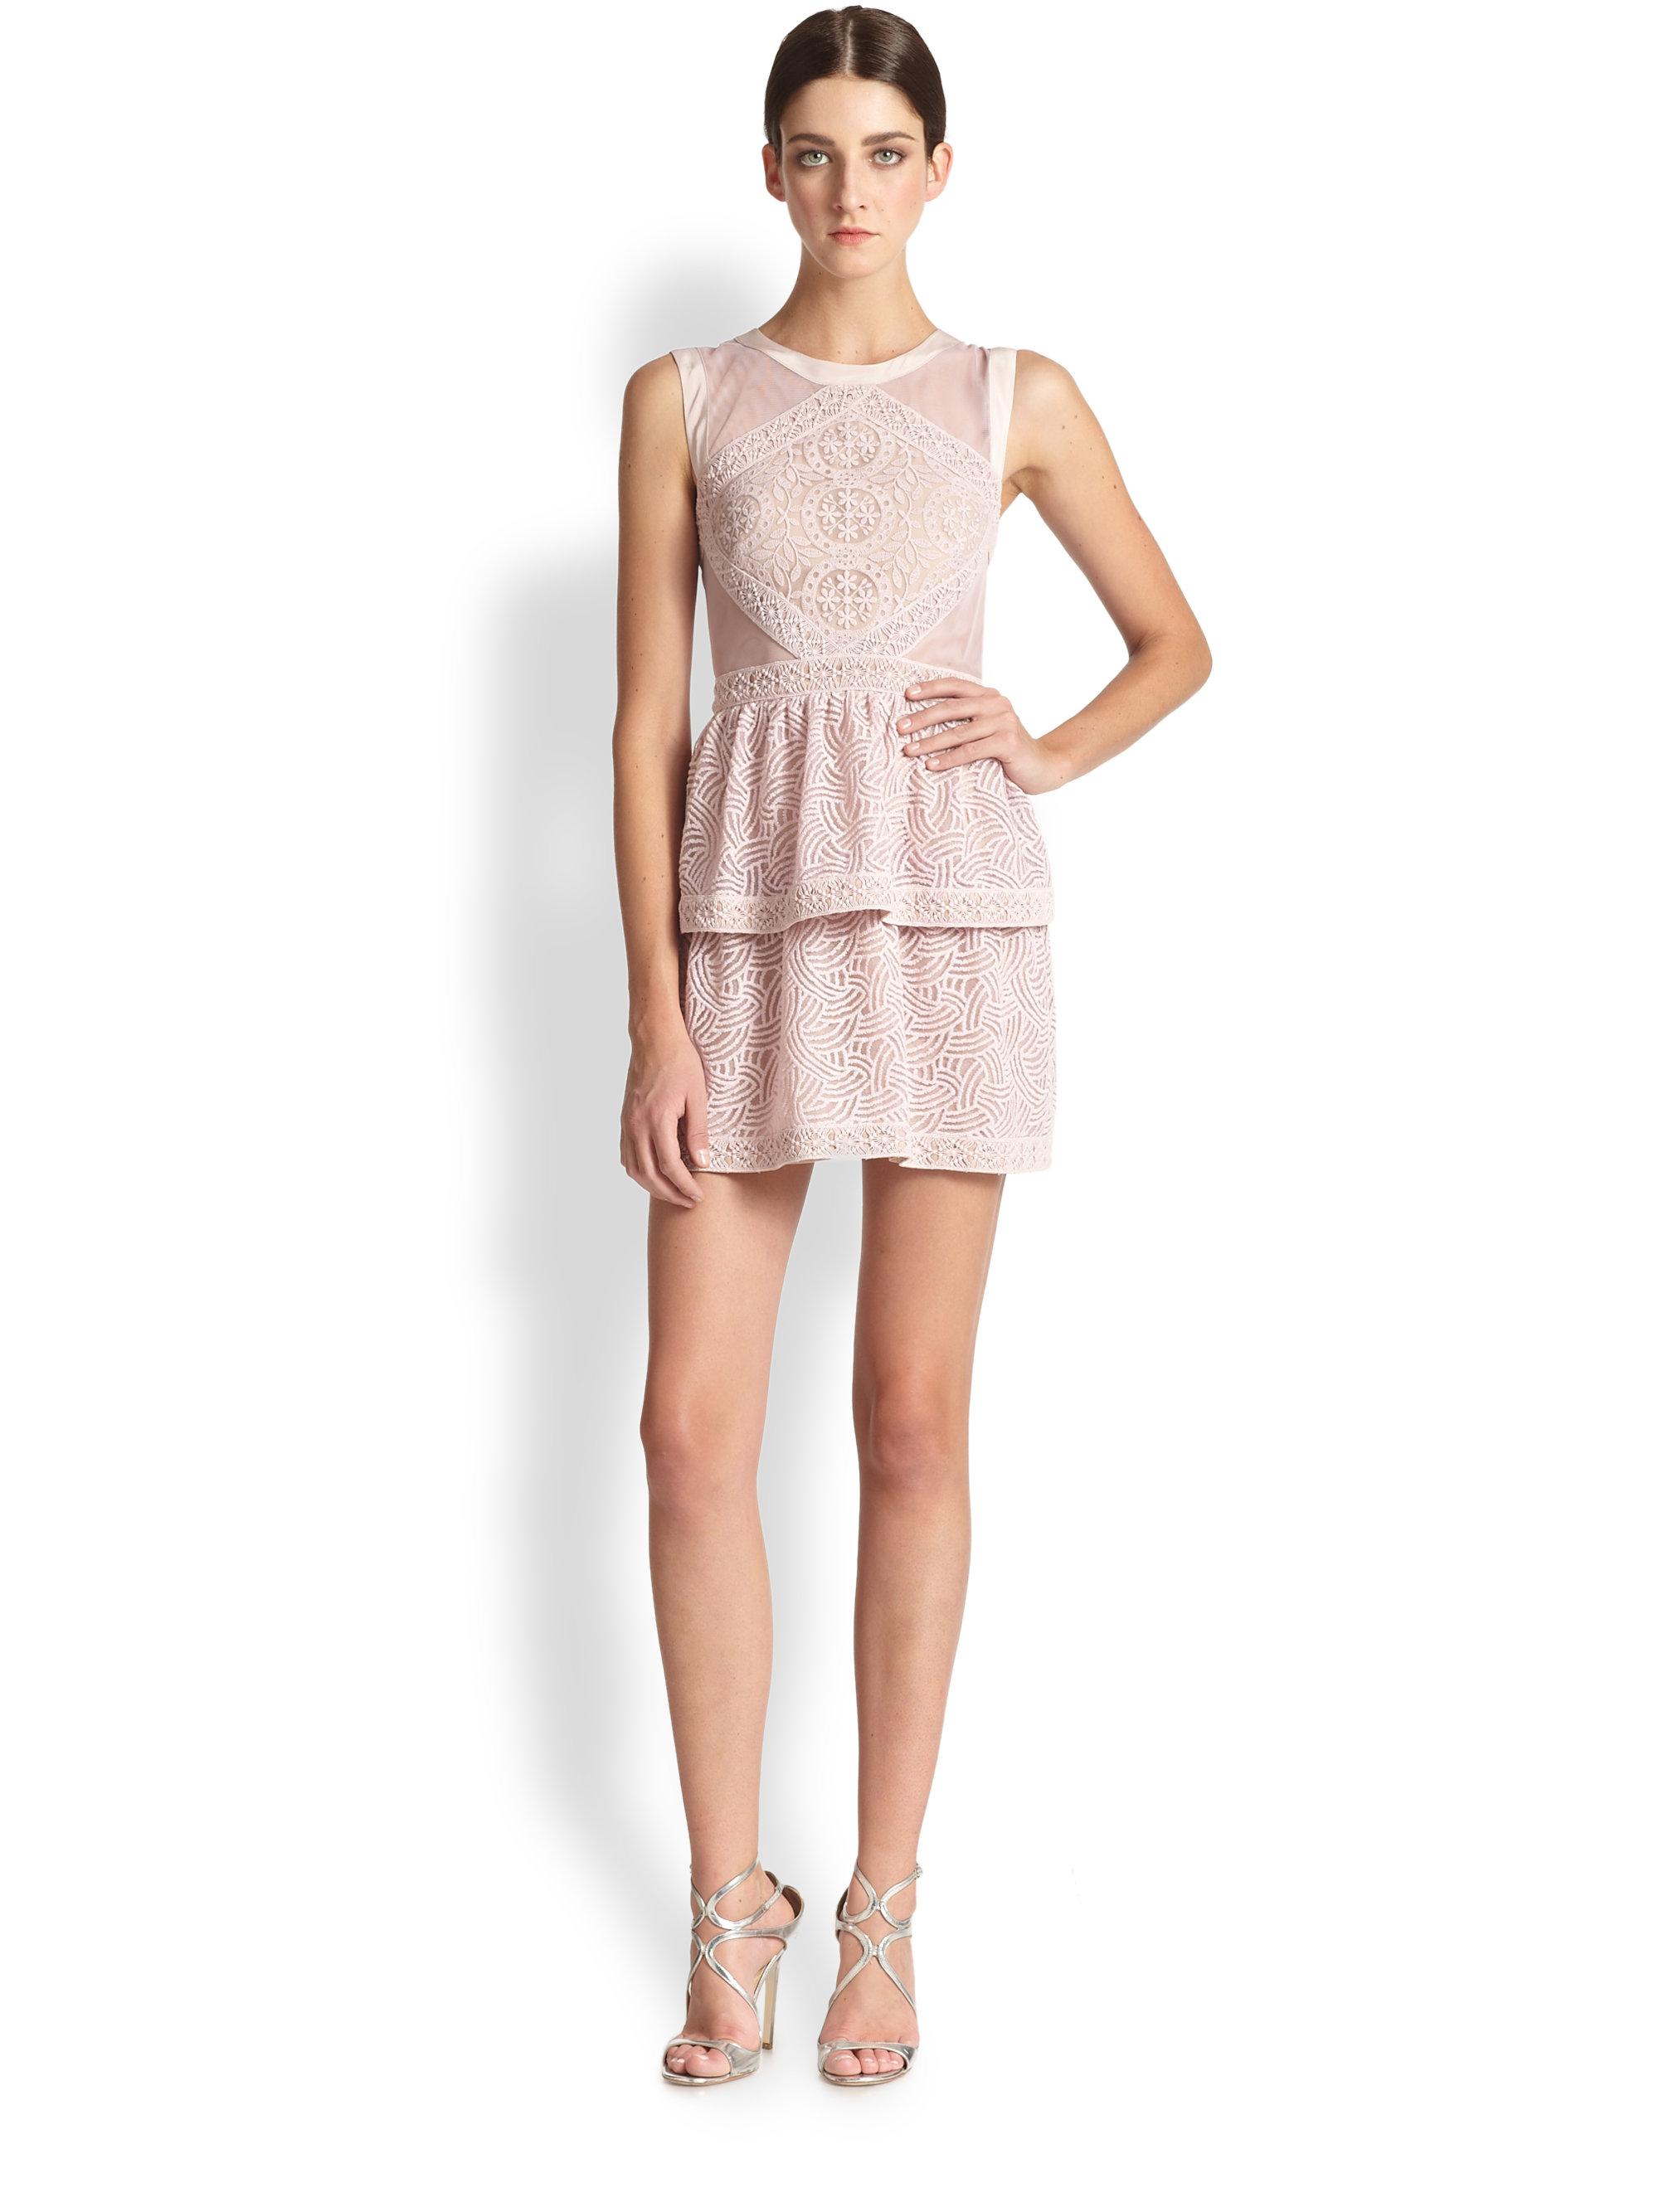 Bcbg purple lace dress – Dress ideas